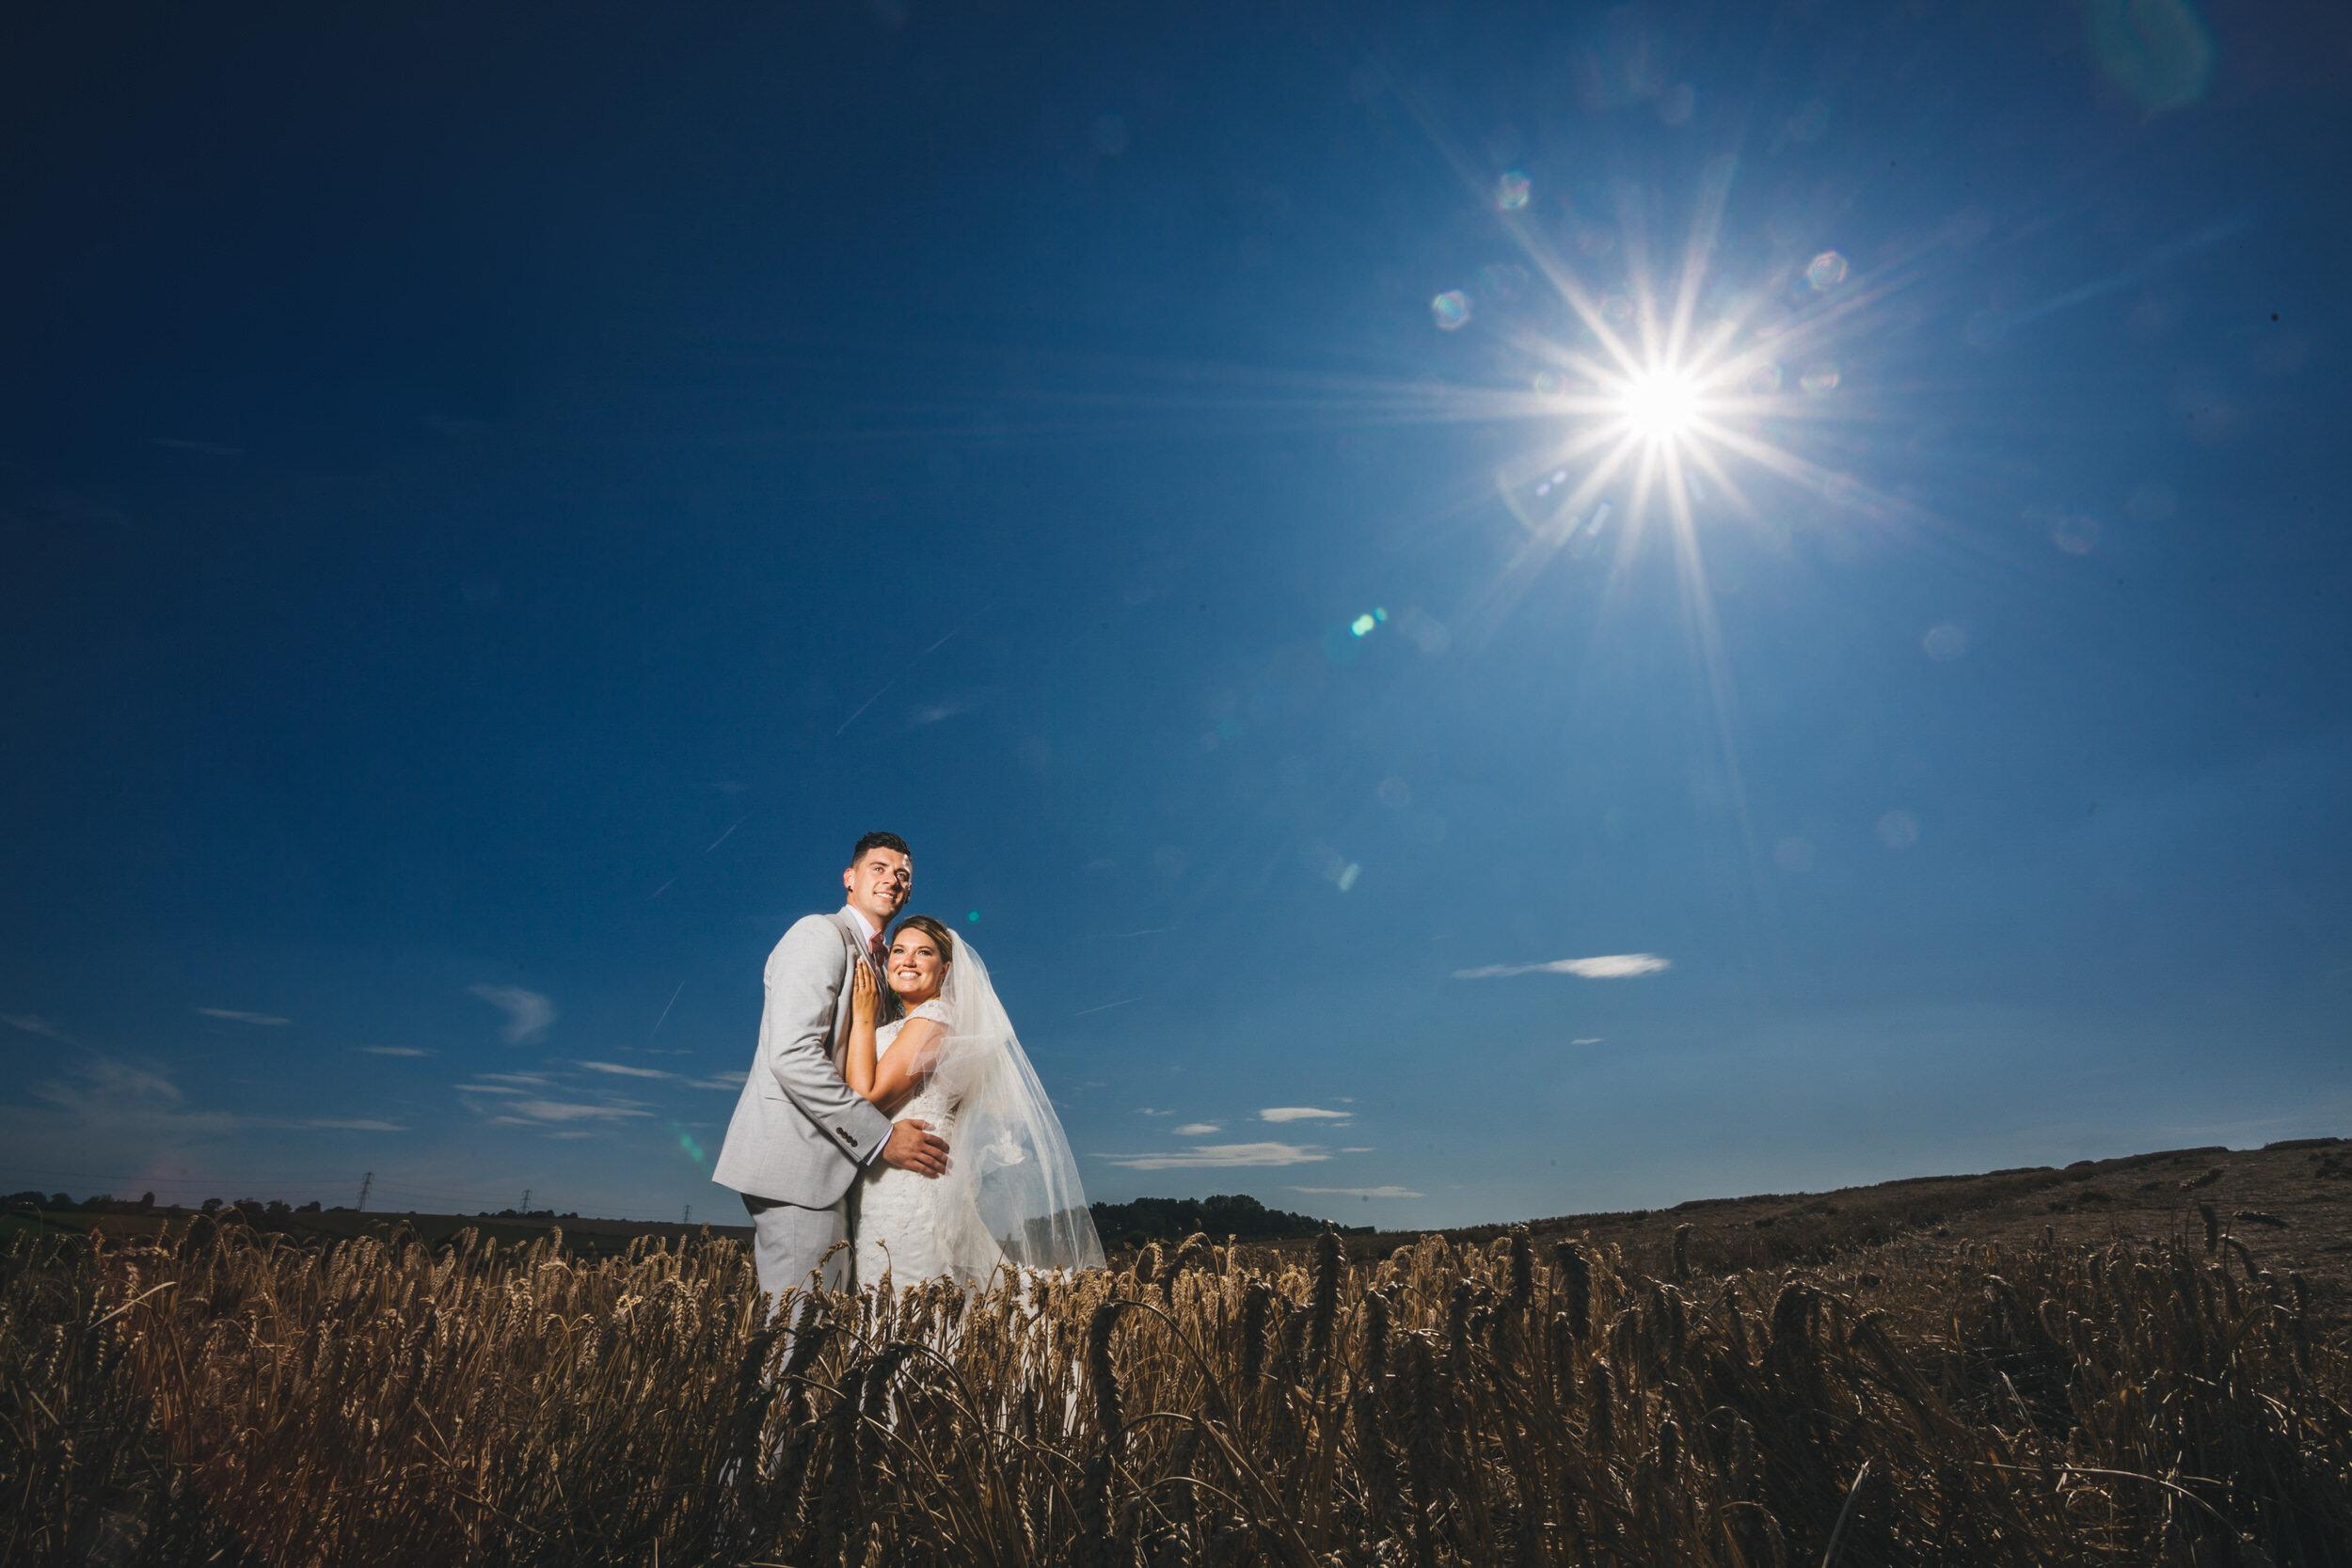 newton house barns wedding photography blog54.jpg